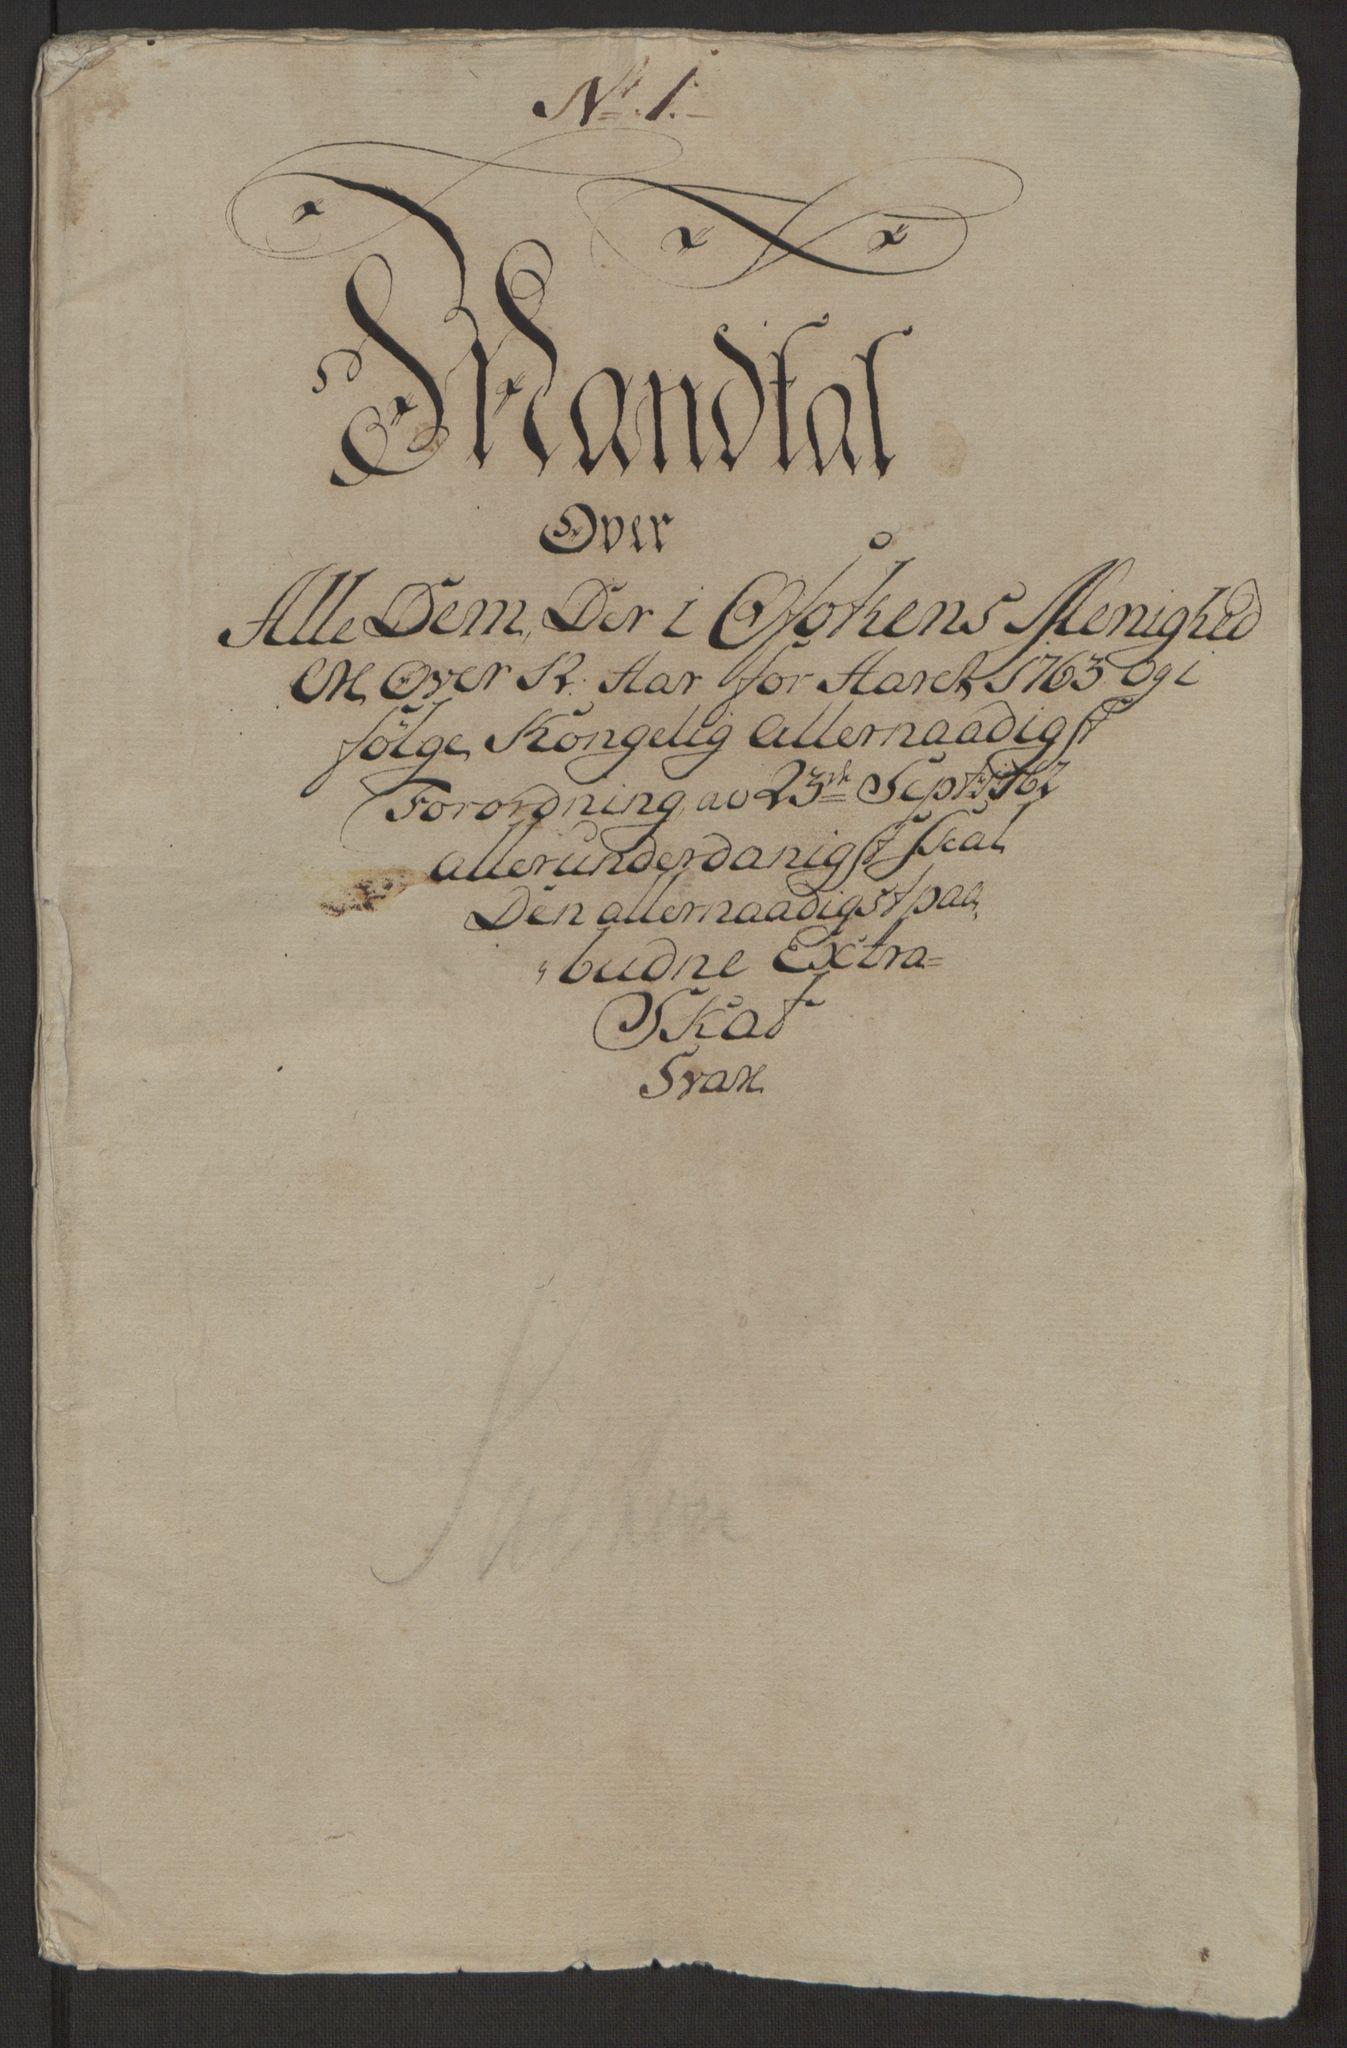 RA, Rentekammeret inntil 1814, Realistisk ordnet avdeling, Ol/L0022a: [Gg 10]: Ekstraskatten, 23.09.1762. Nordlands amt, 1762-1763, s. 2